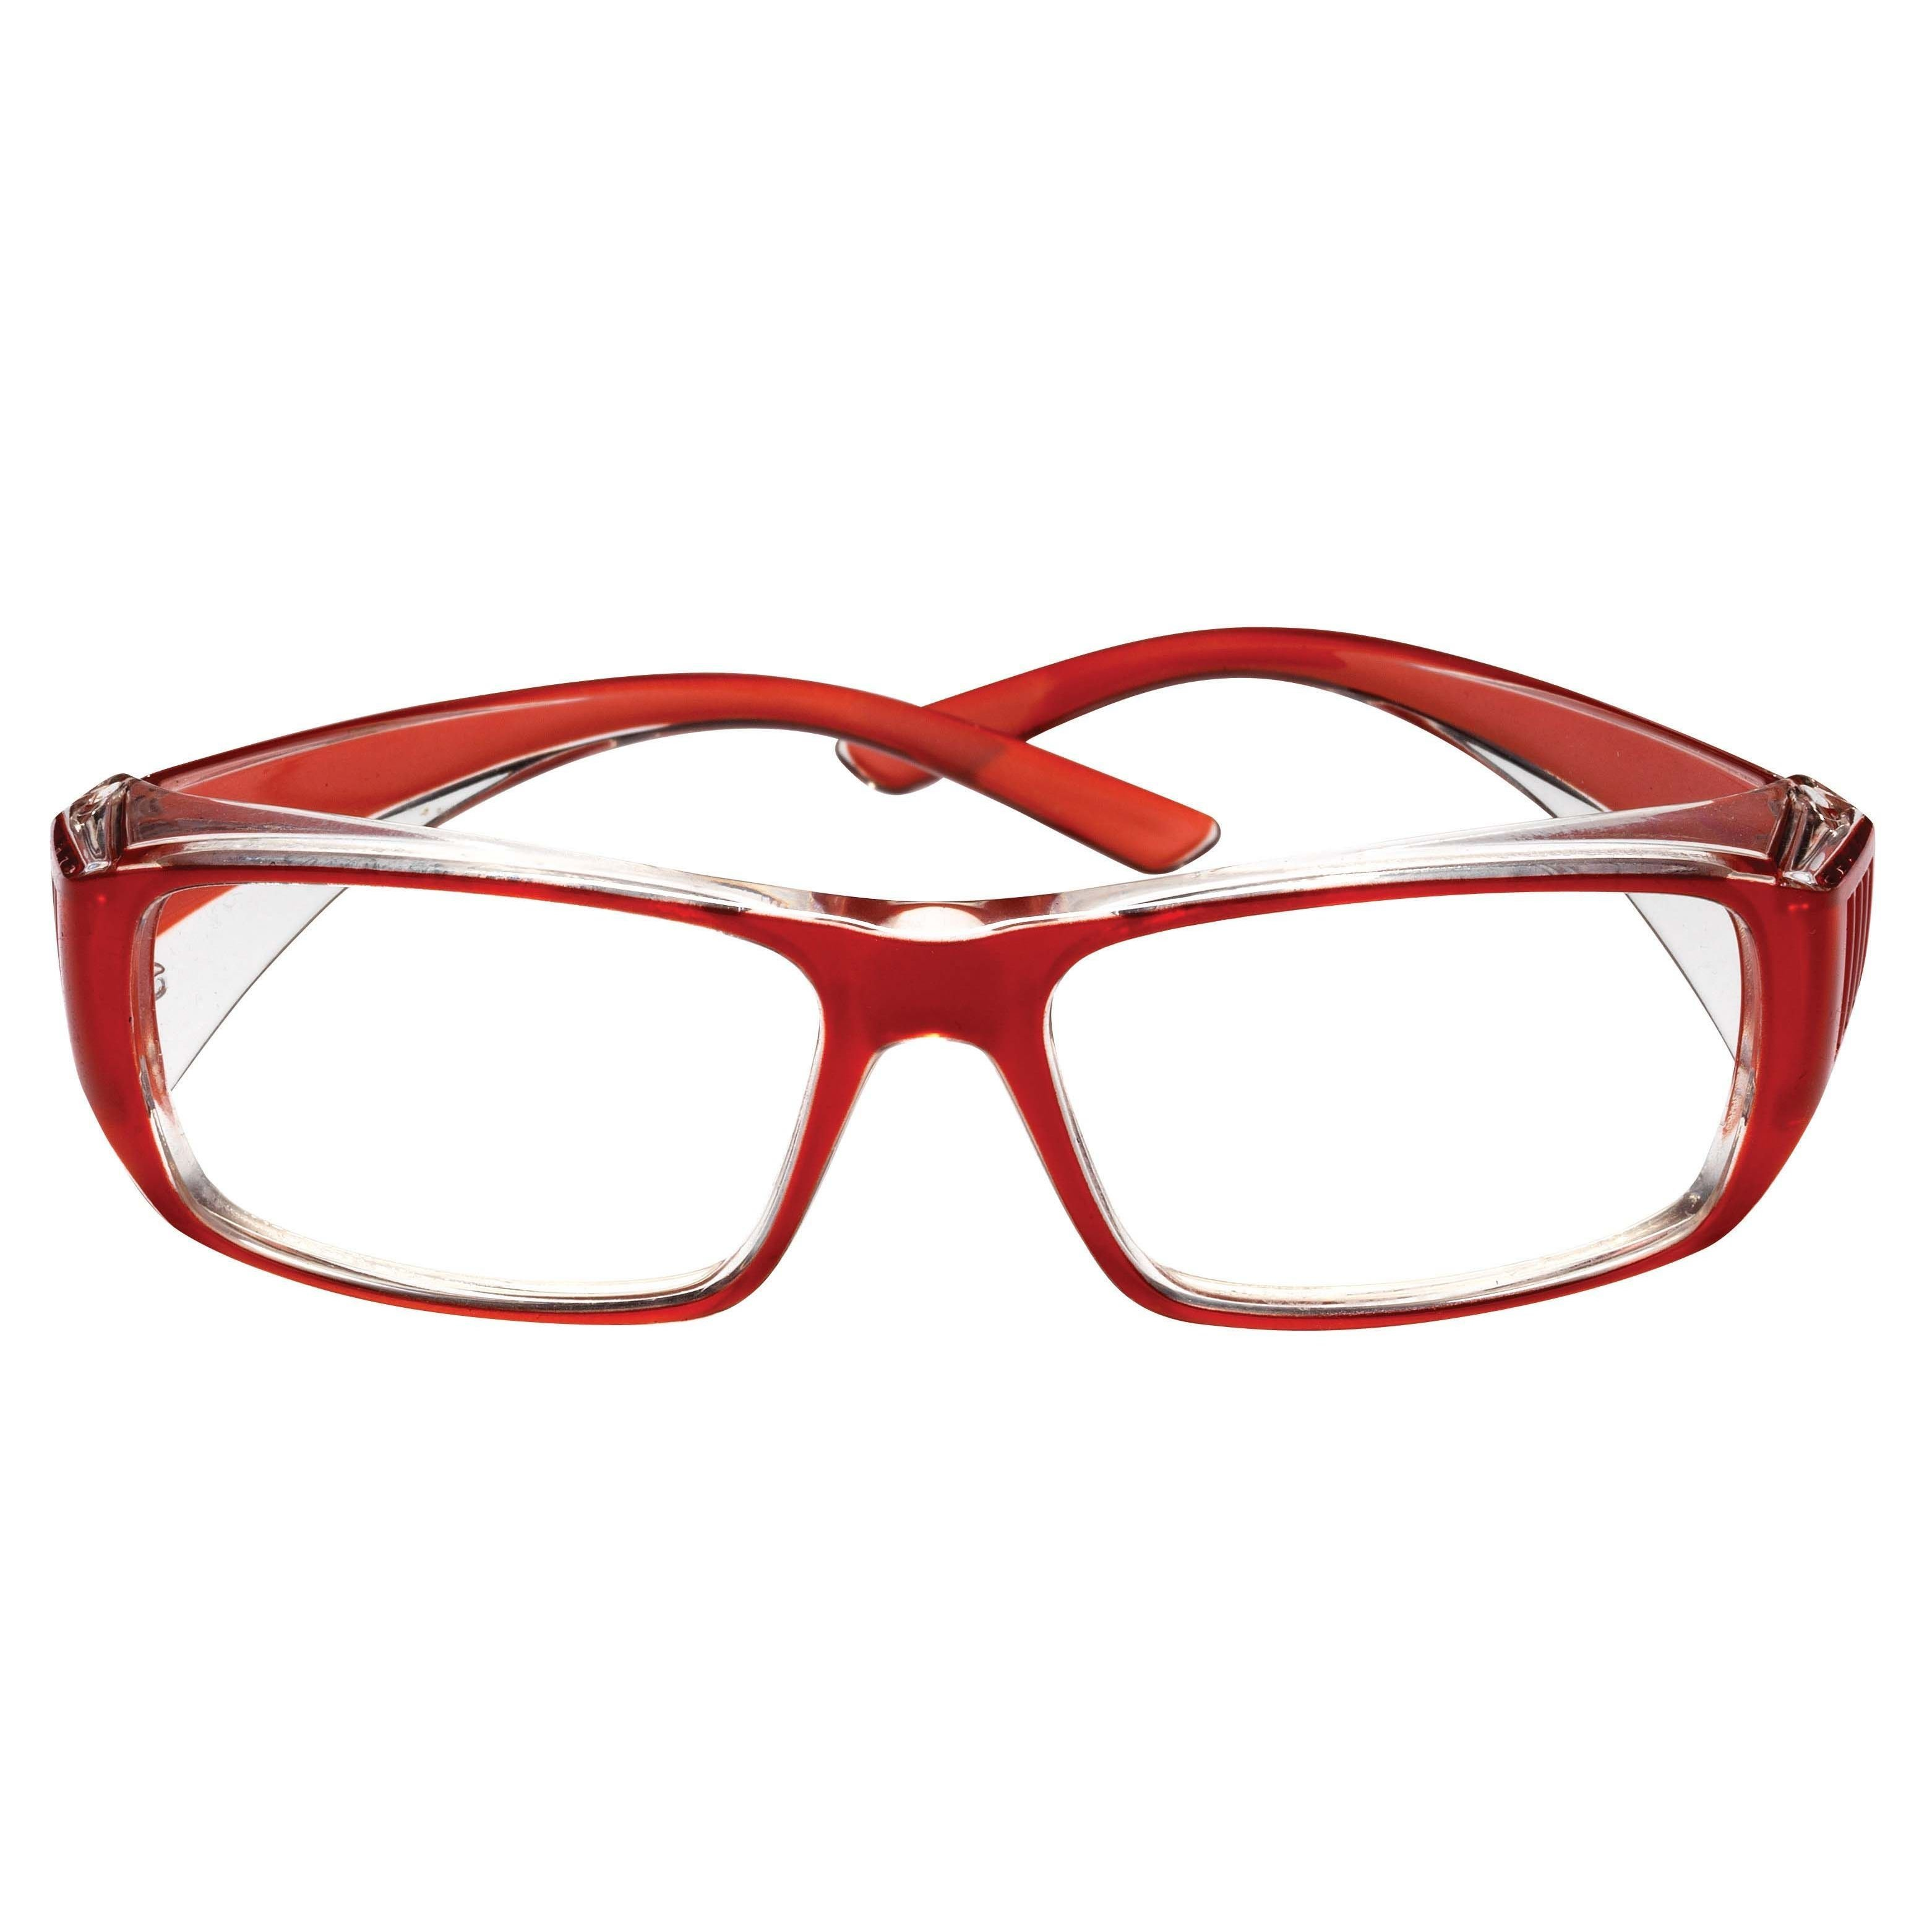 Bolle B808 Prescription Safety Glasses